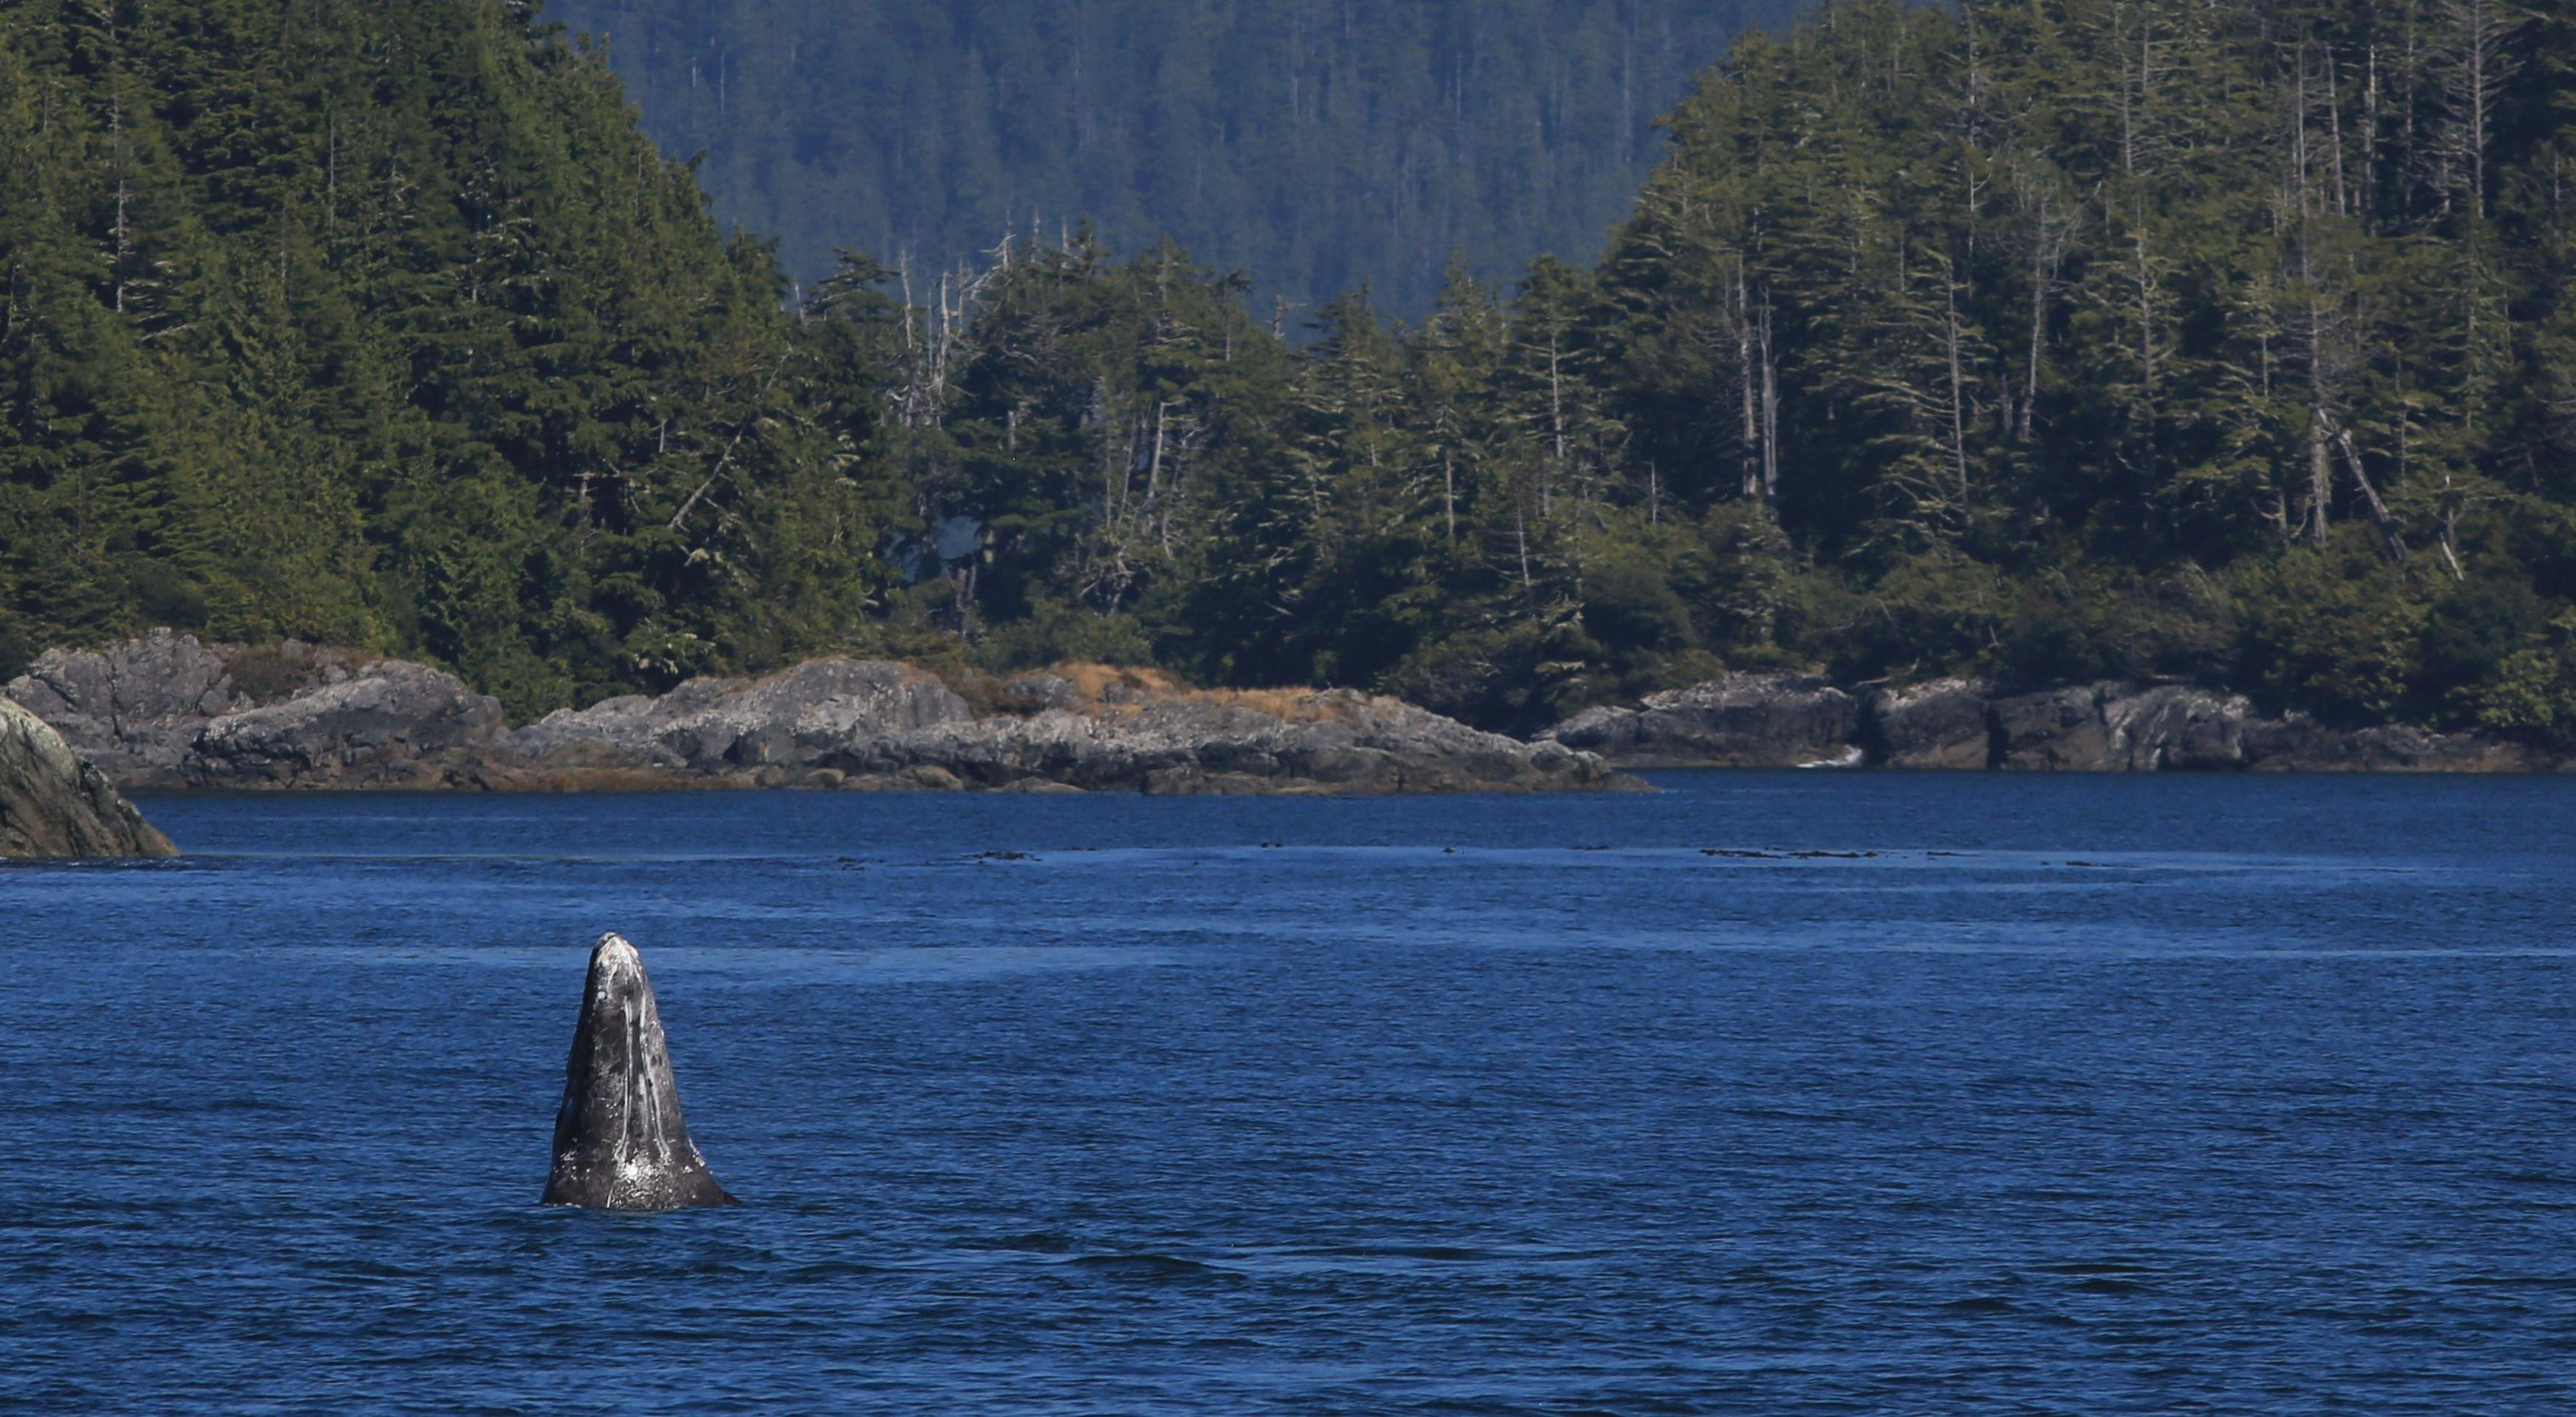 A whale breaches off the shores of Tofino in coastal British Columbia.